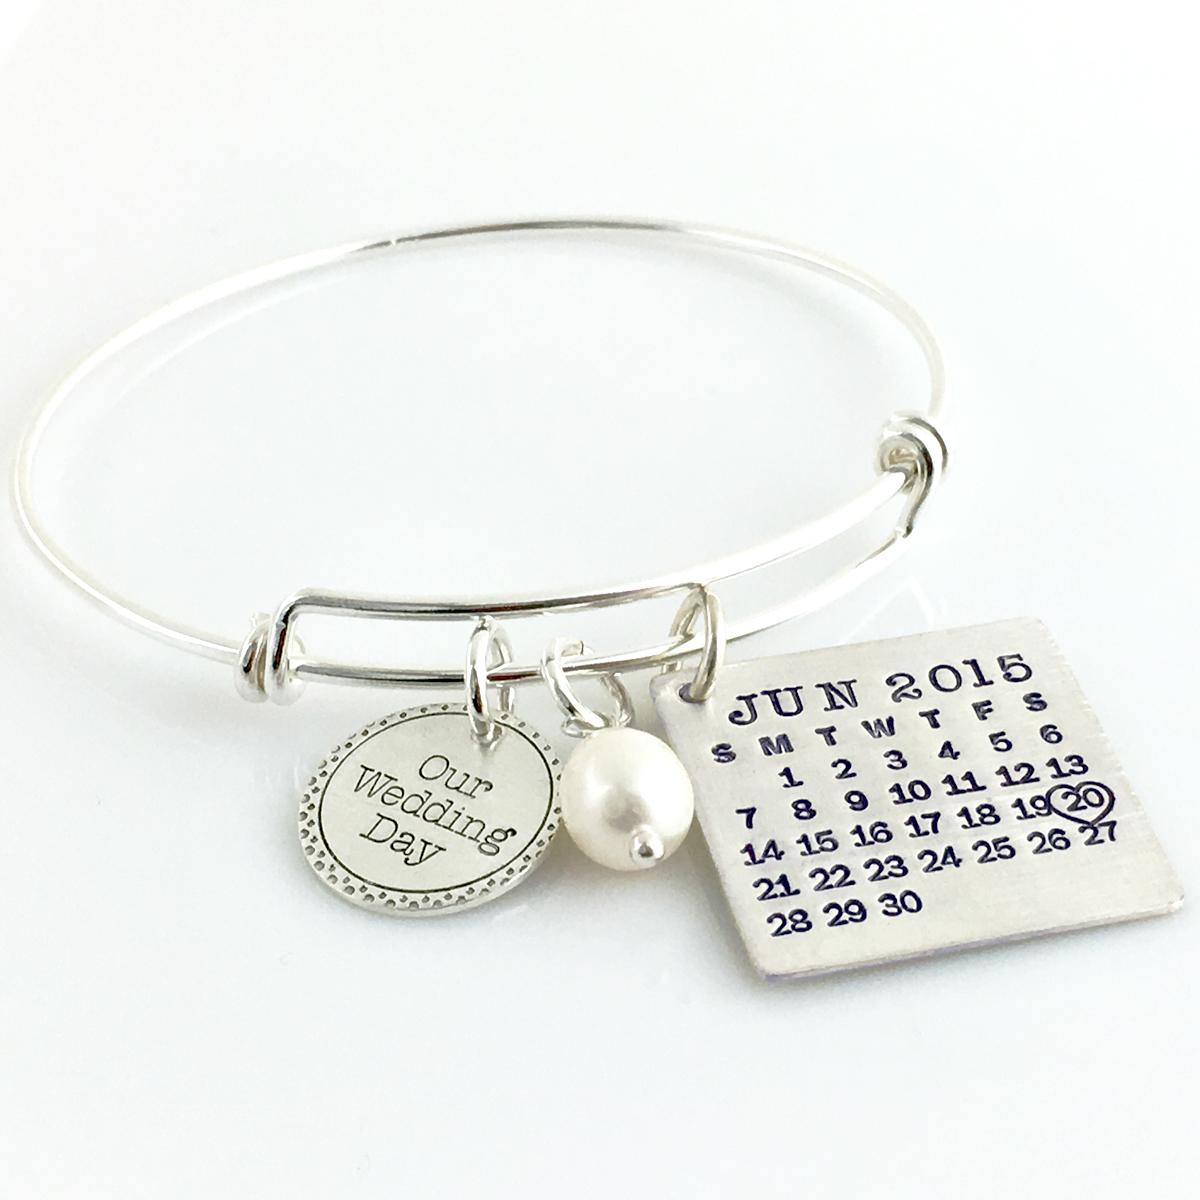 Mark Your Calendar Bangle Bracelet with Our Wedding Day Charm